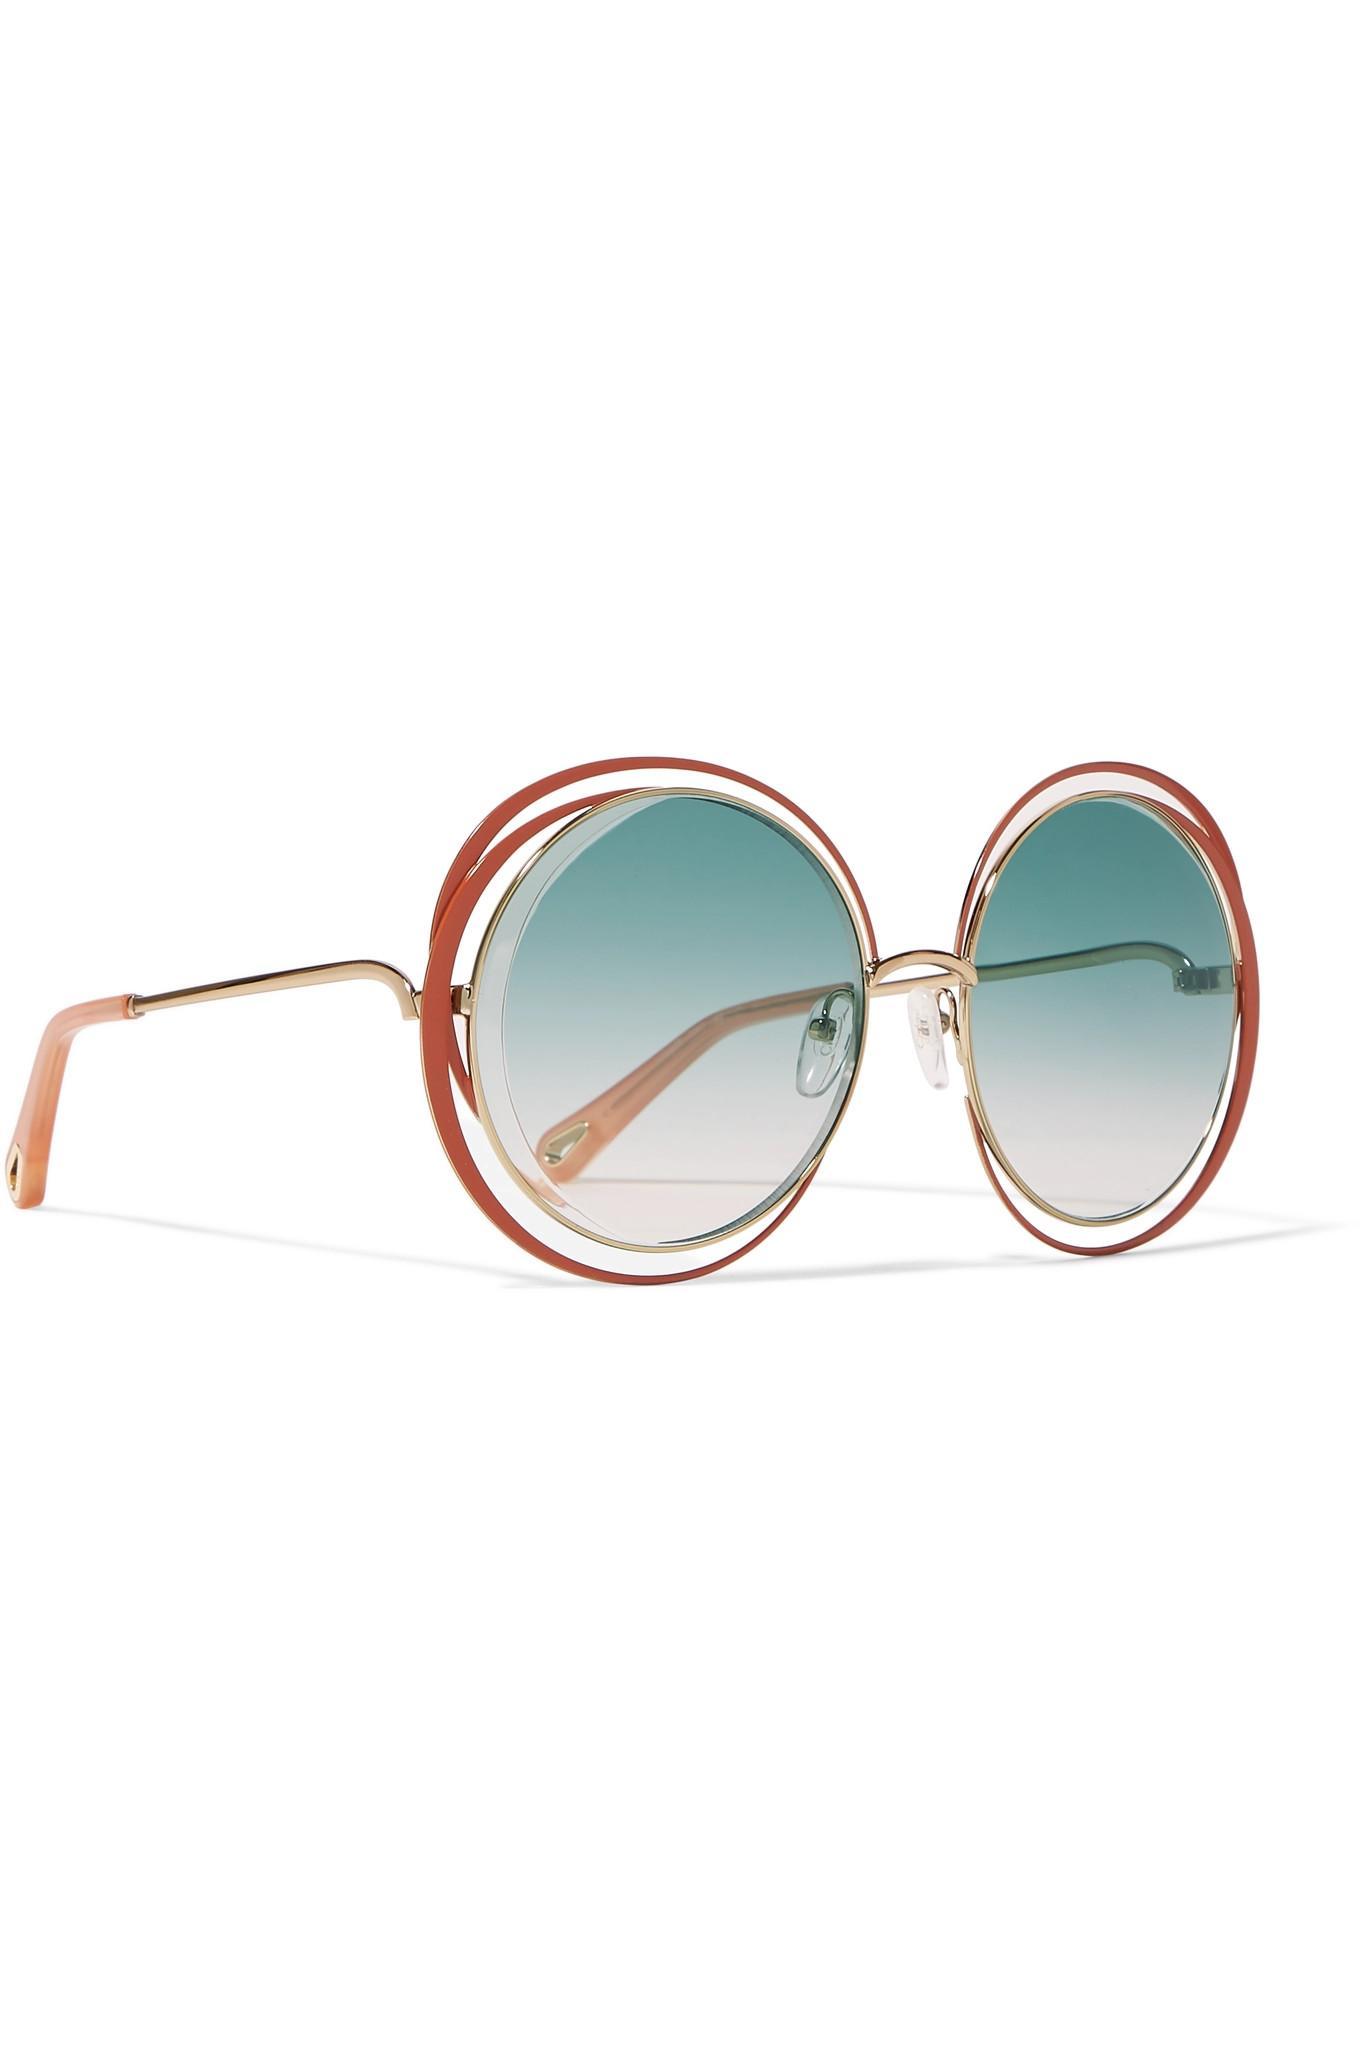 3a0c3d179bf1 Chloé - Blue Carlina Oversized Round-frame Gold-tone Sunglasses - Lyst.  View fullscreen